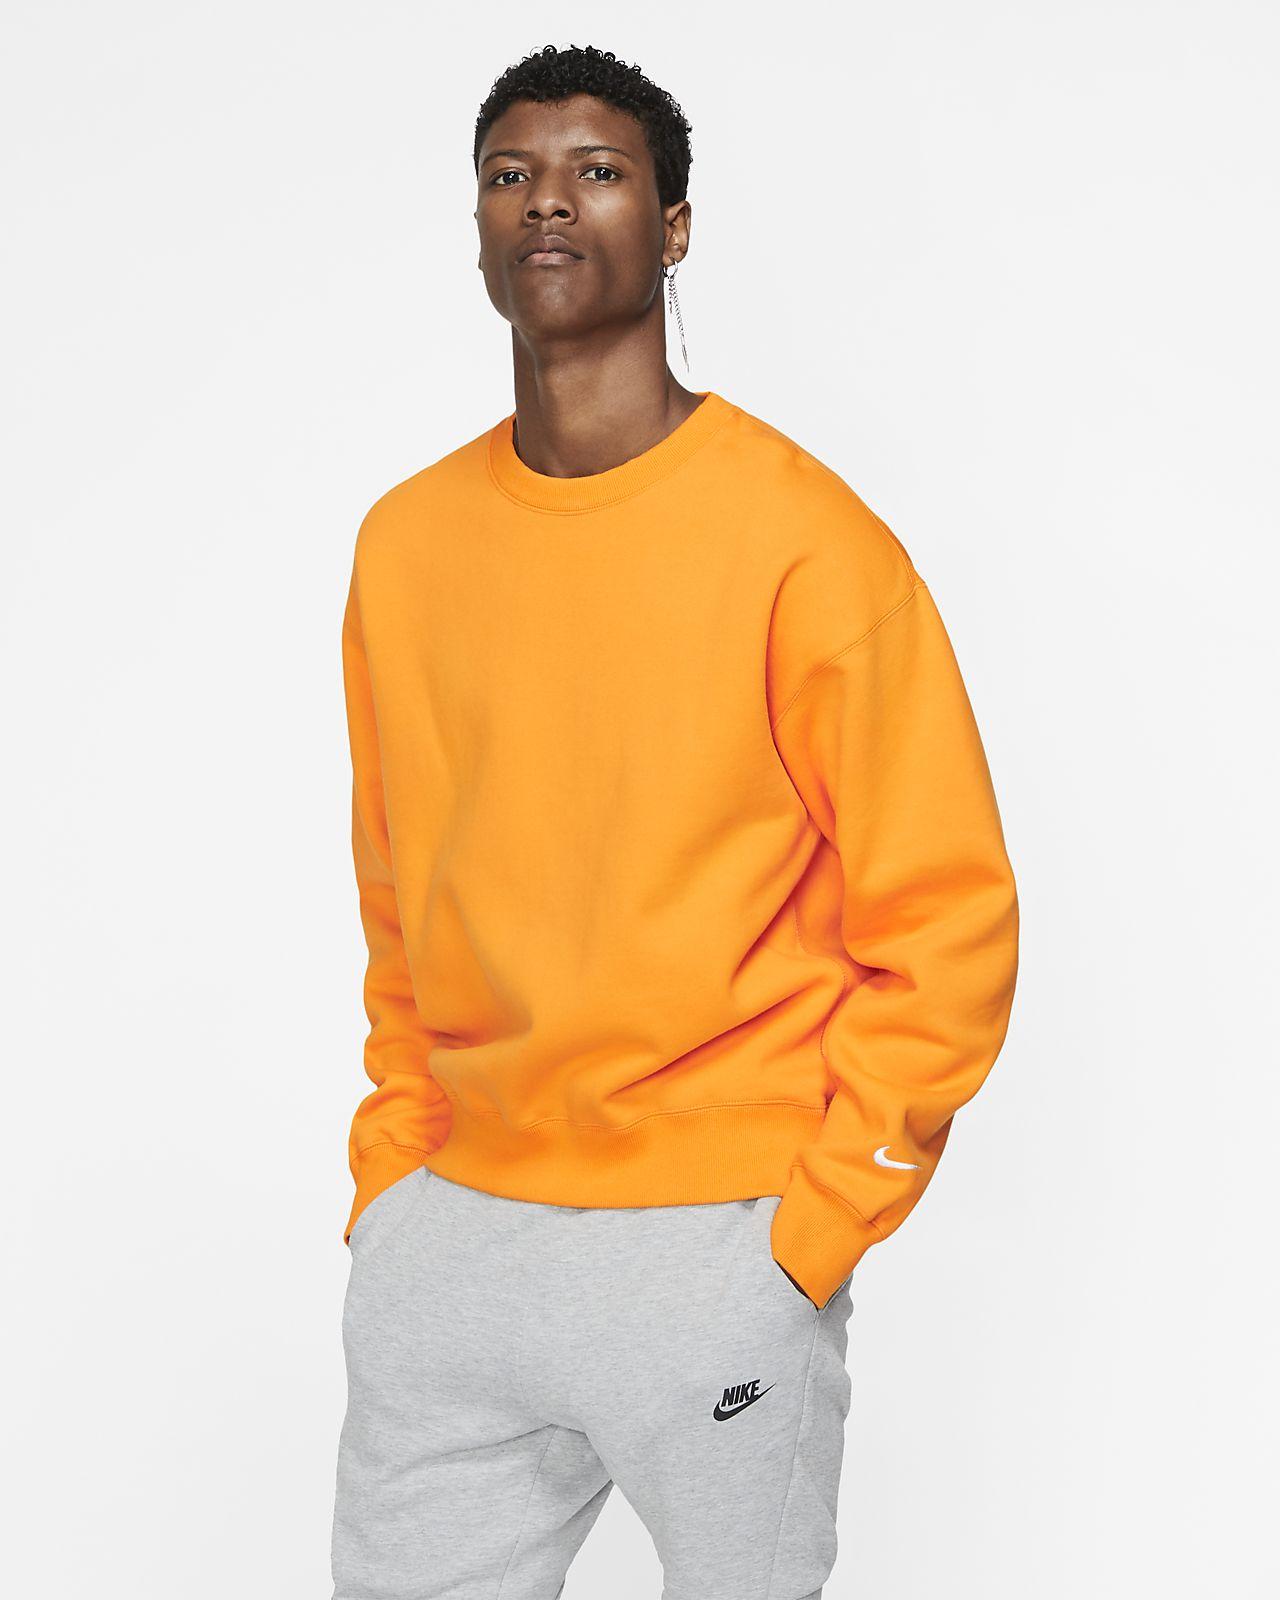 NikeLab Collection 男子圆领上衣